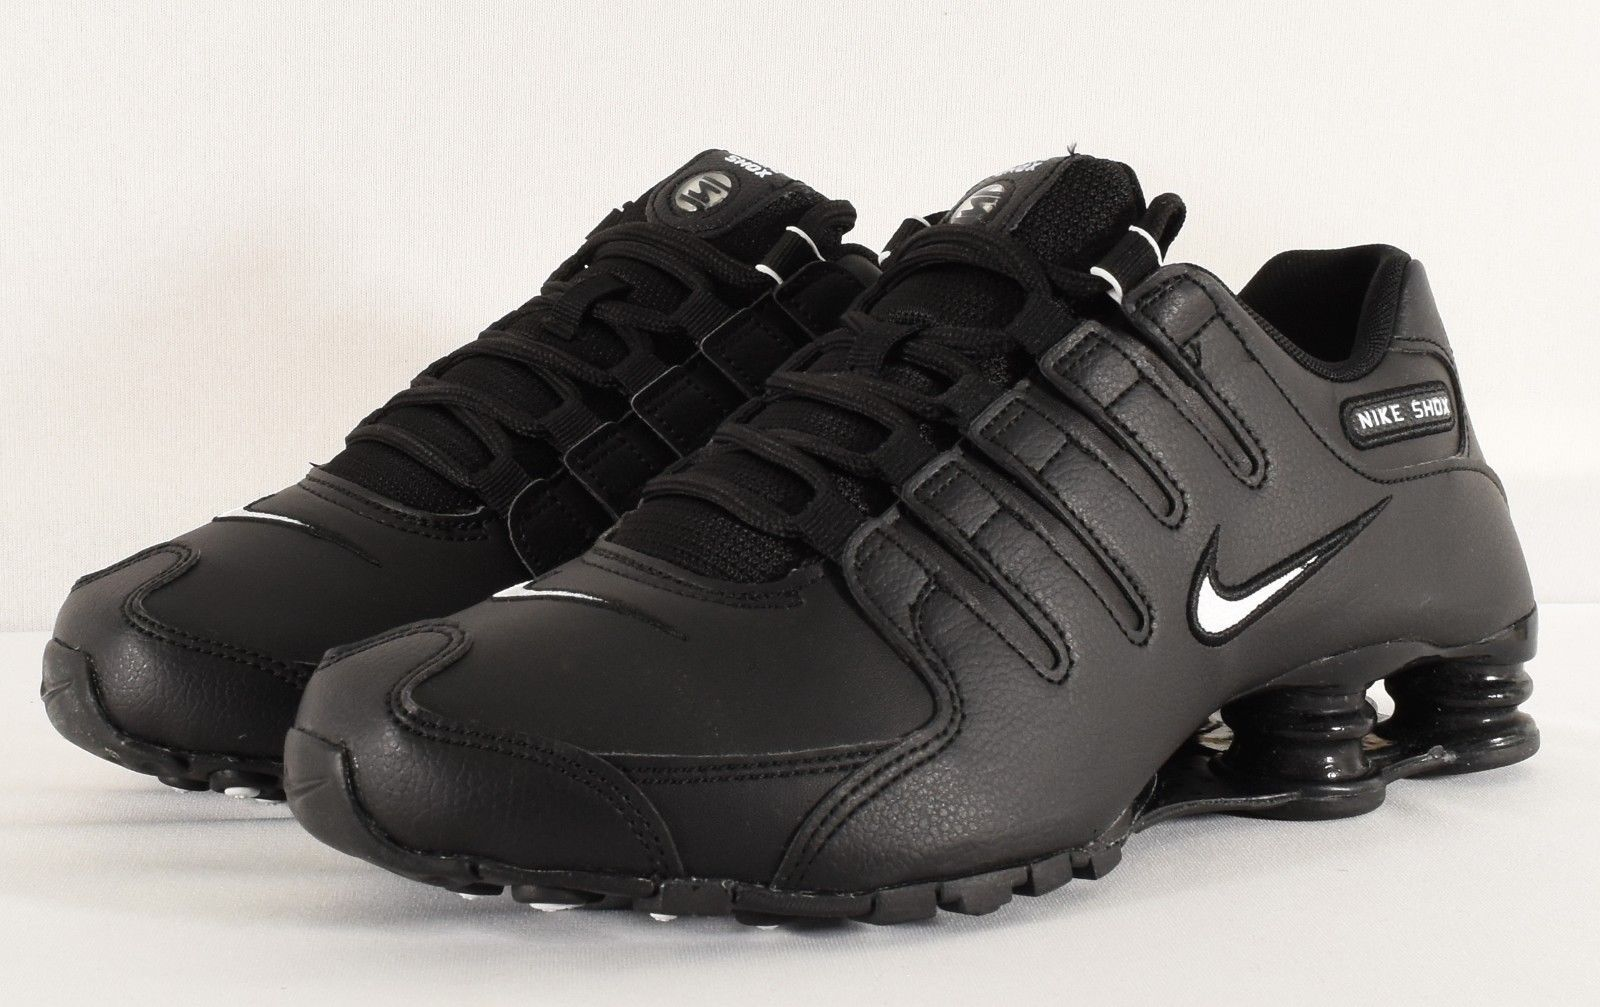 separation shoes 9e264 3dc60 NIKE Hommes Chaussures Shox NZ EU Noir   Blanc (501524 091)  Blanc